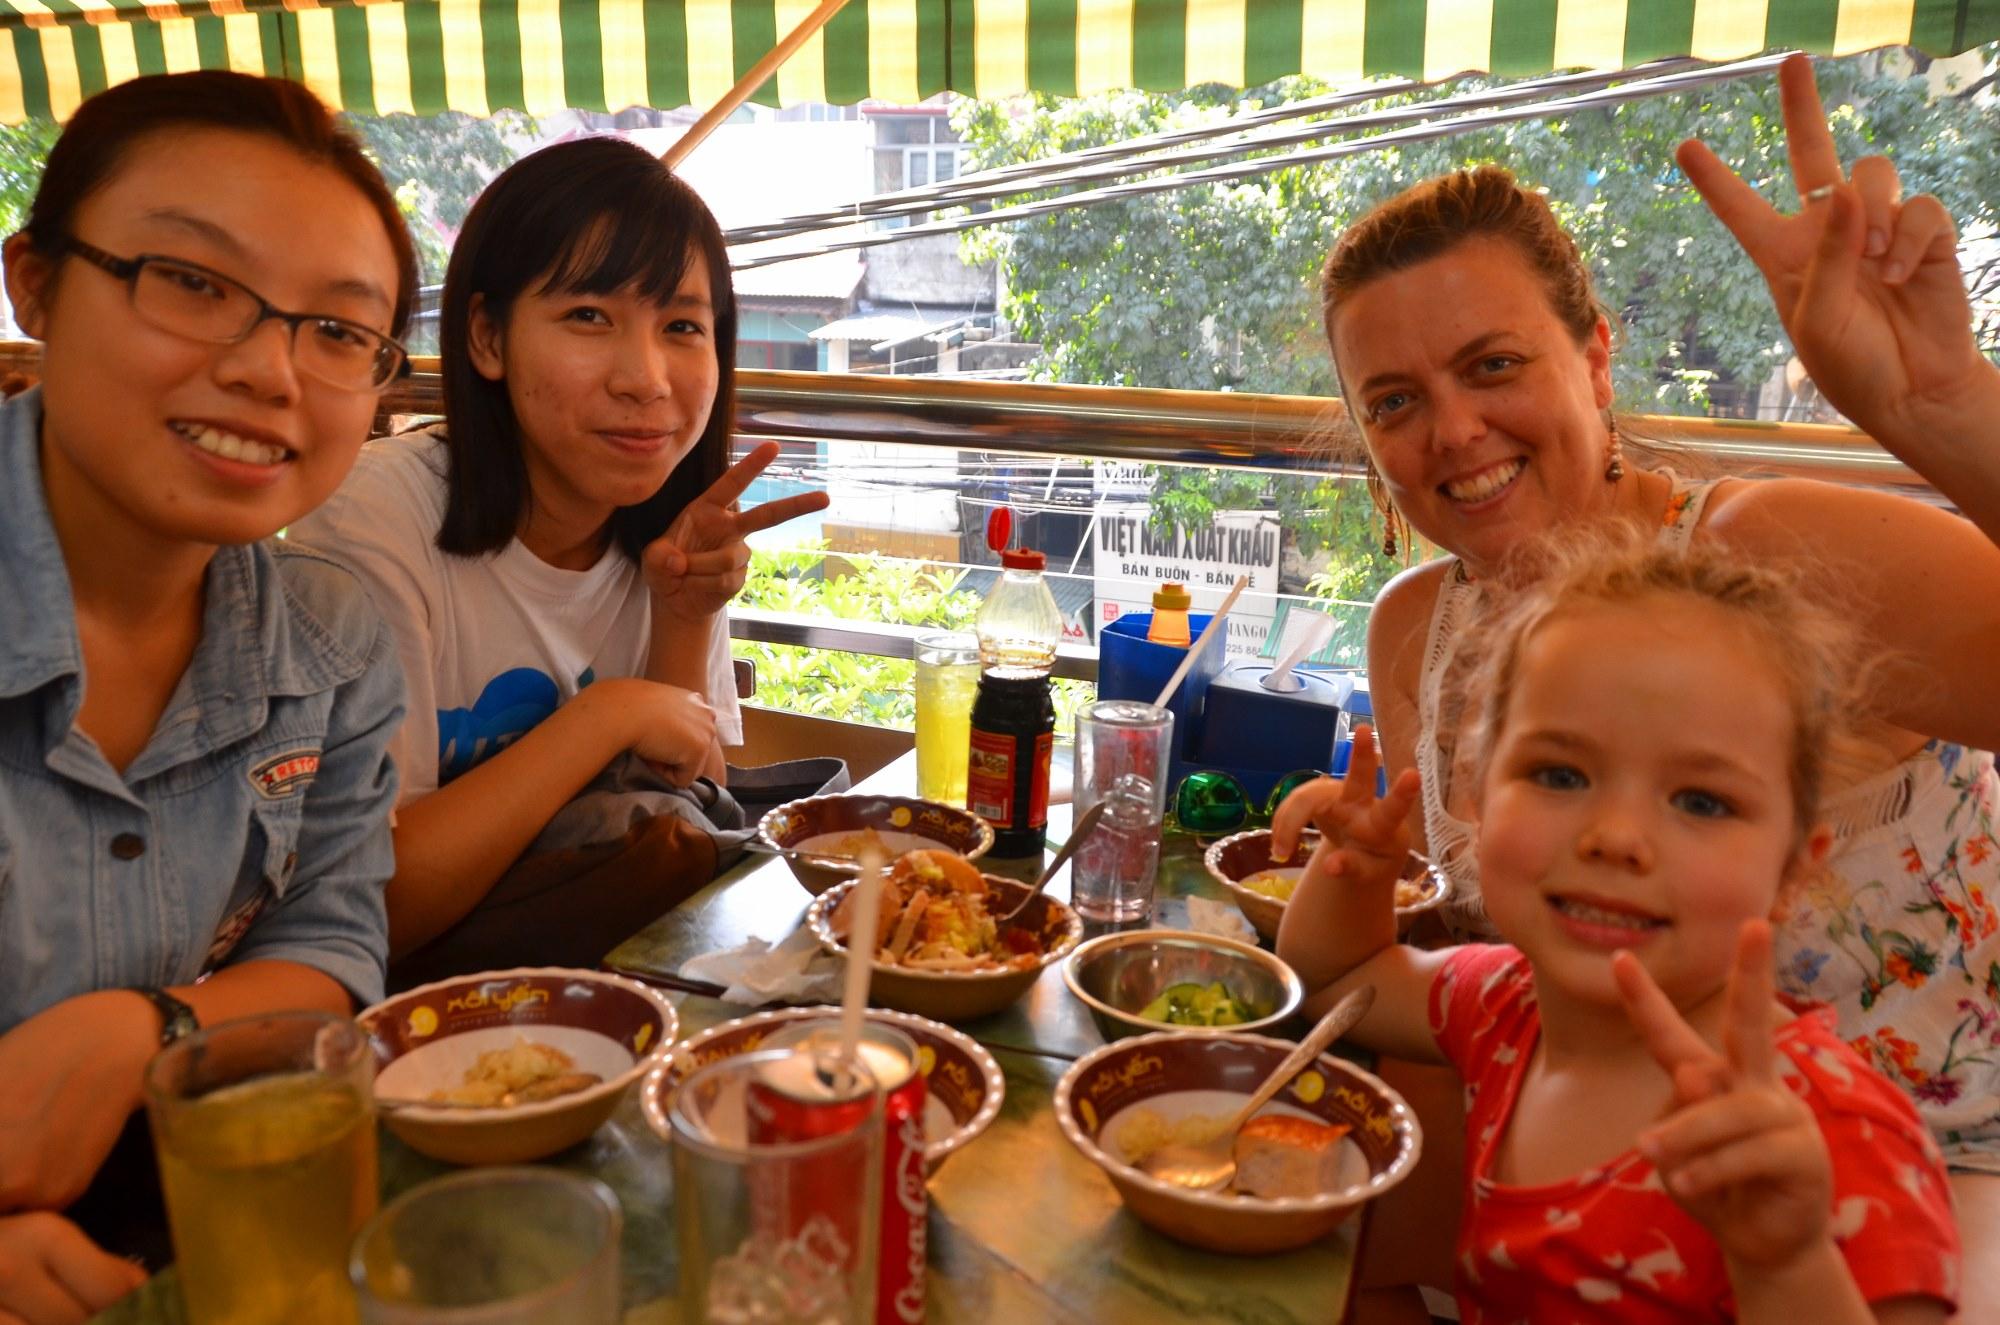 xoi comida hanoi vietnam hanoi kids